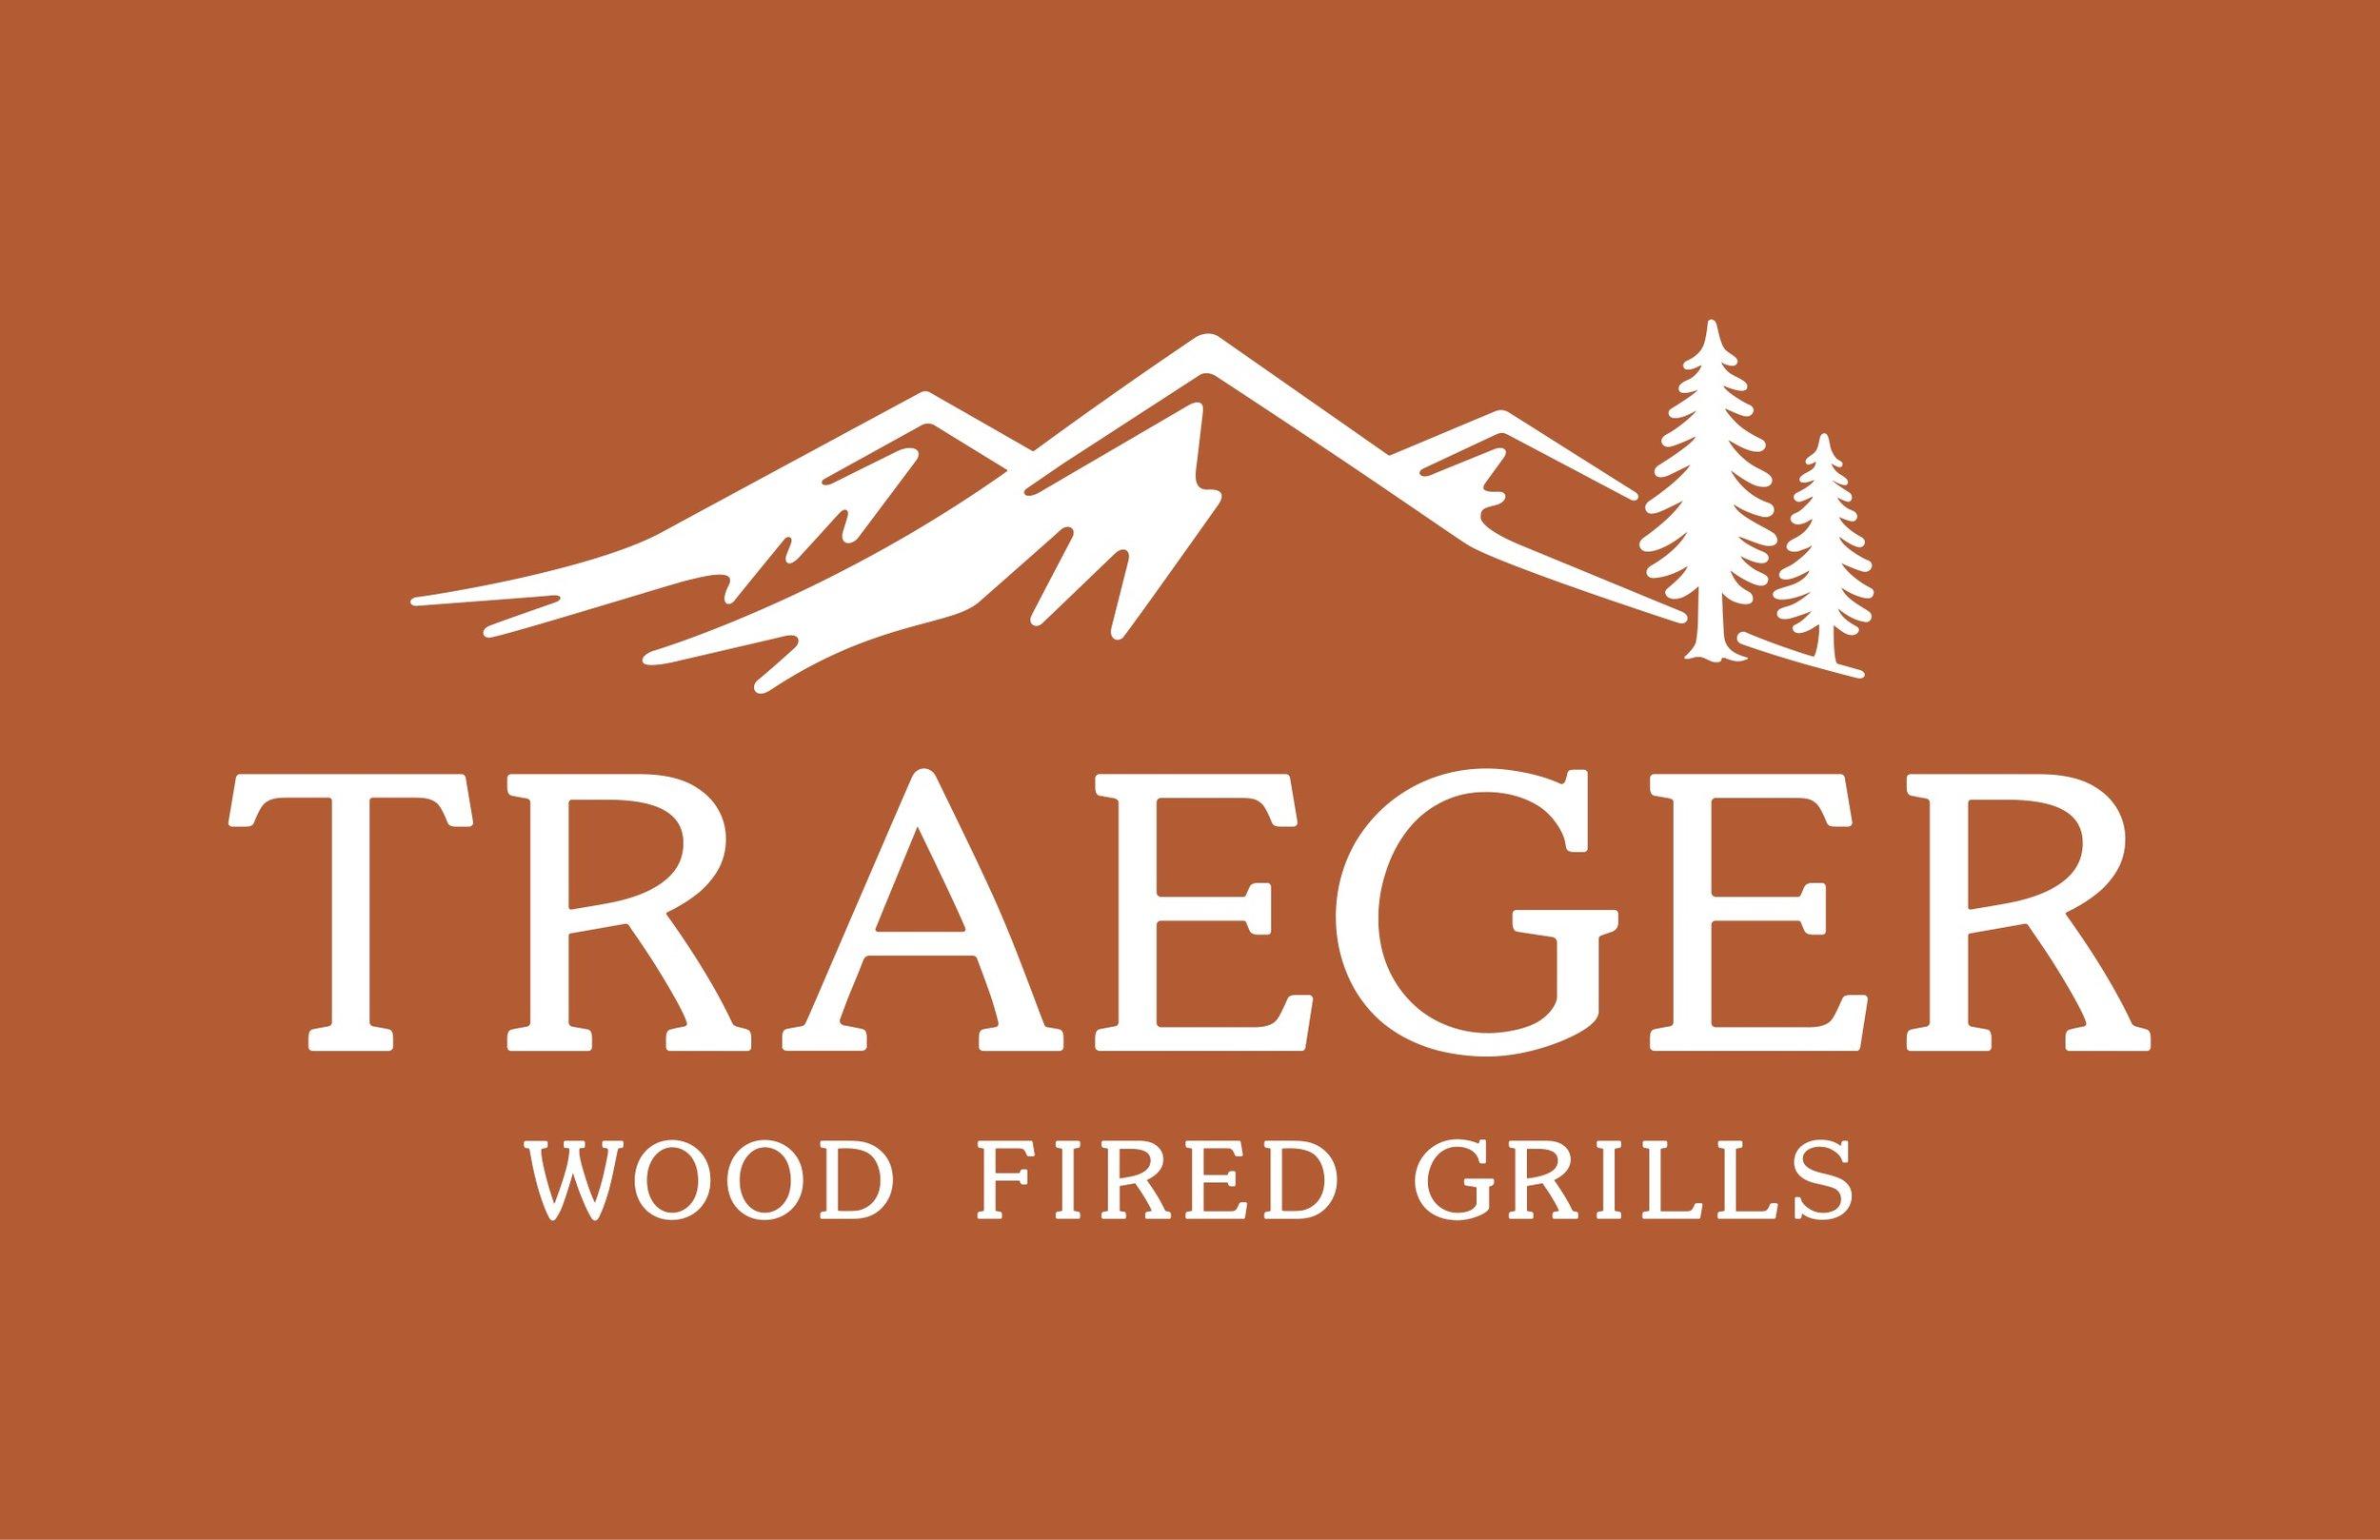 BF-Logos_Traeger Logo White on Orange_Traeger_CS4.jpg